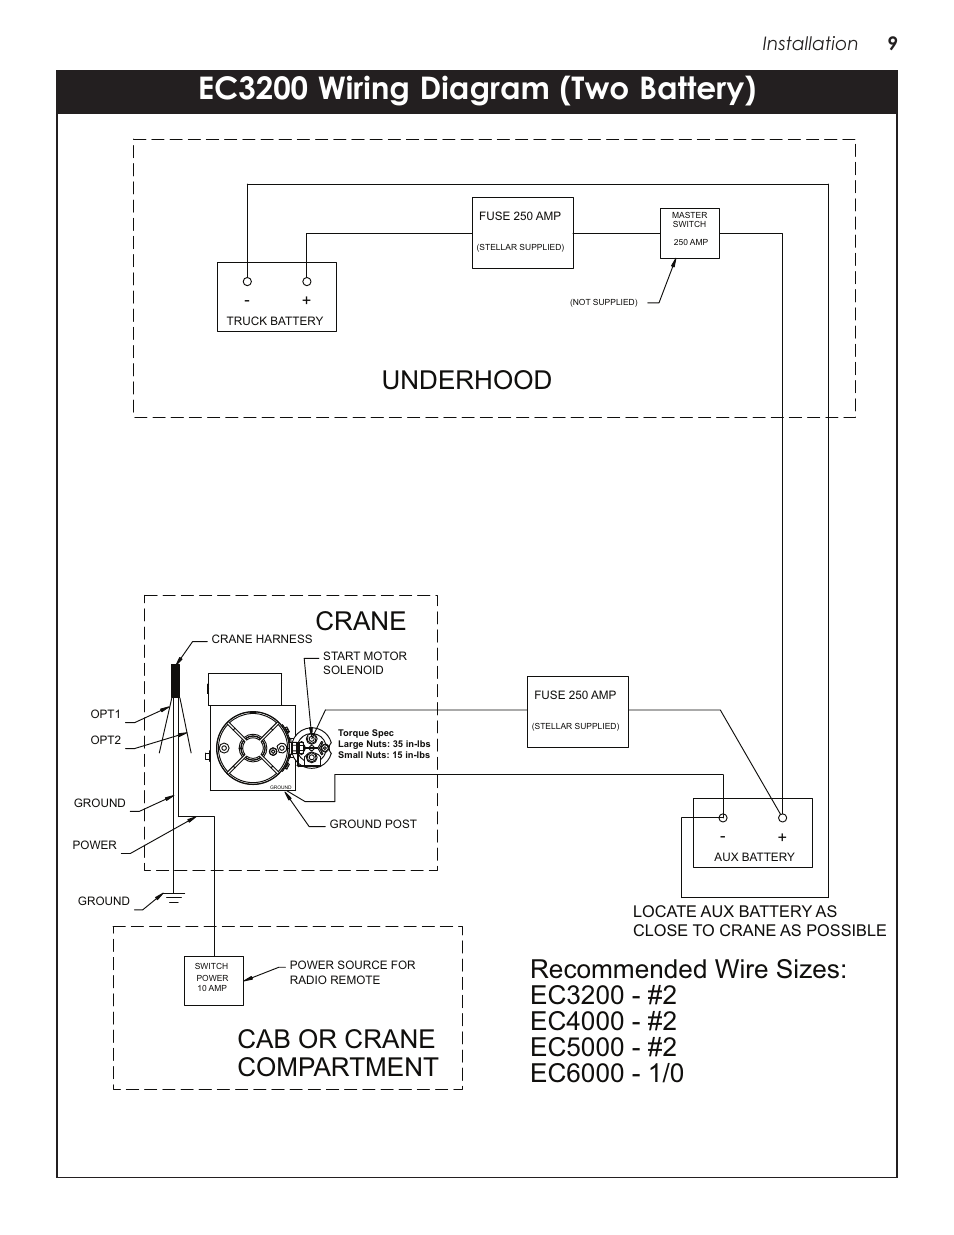 medium resolution of ec3200 wiring diagram two battery ec3200 wiring diagram one battery underhood stellar industries crane ec3200 user manual page 13 28